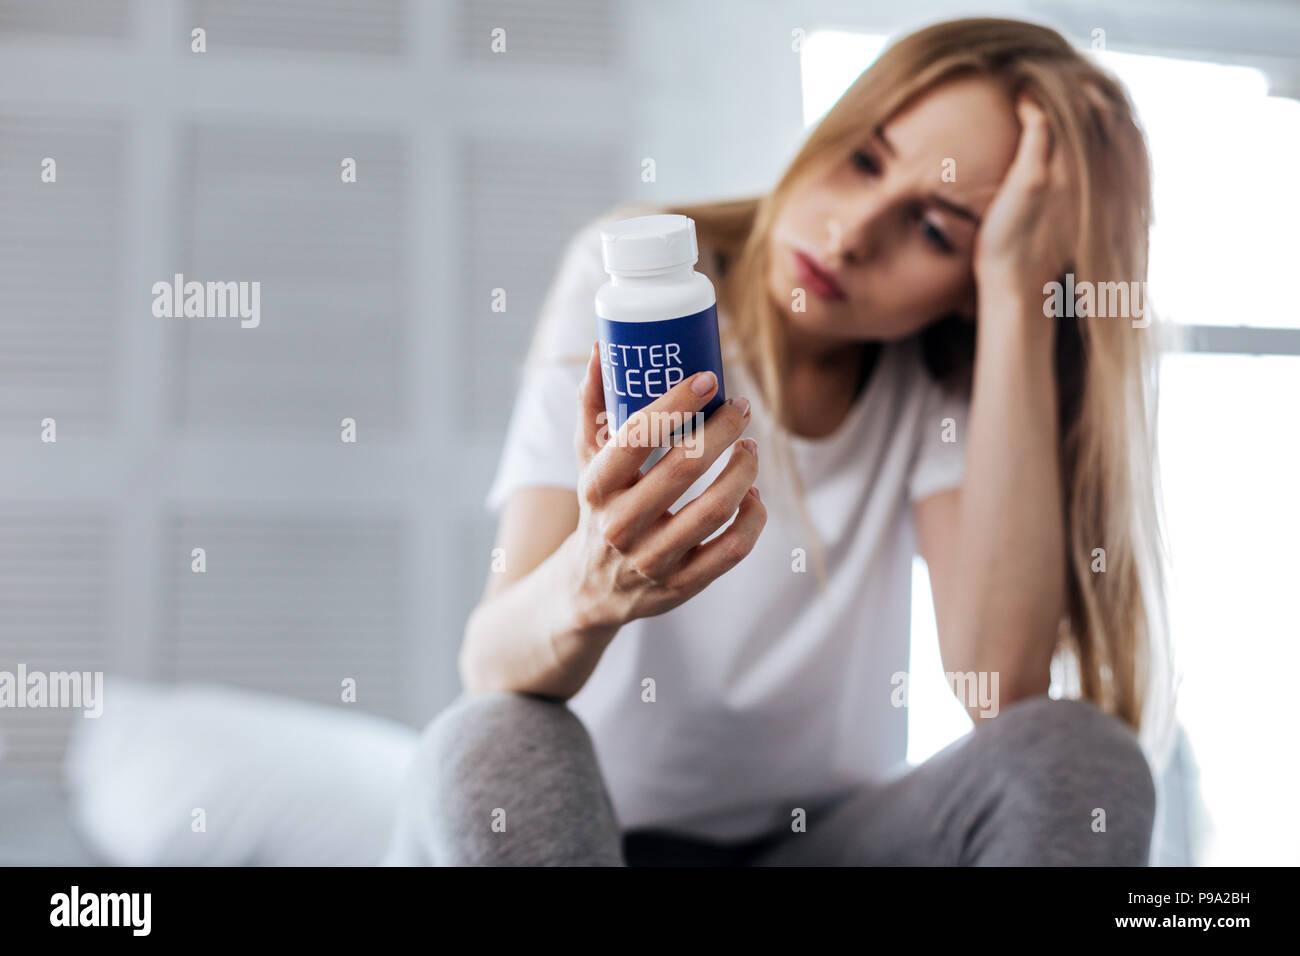 Sad woman looking at her sleeping pills - Stock Image